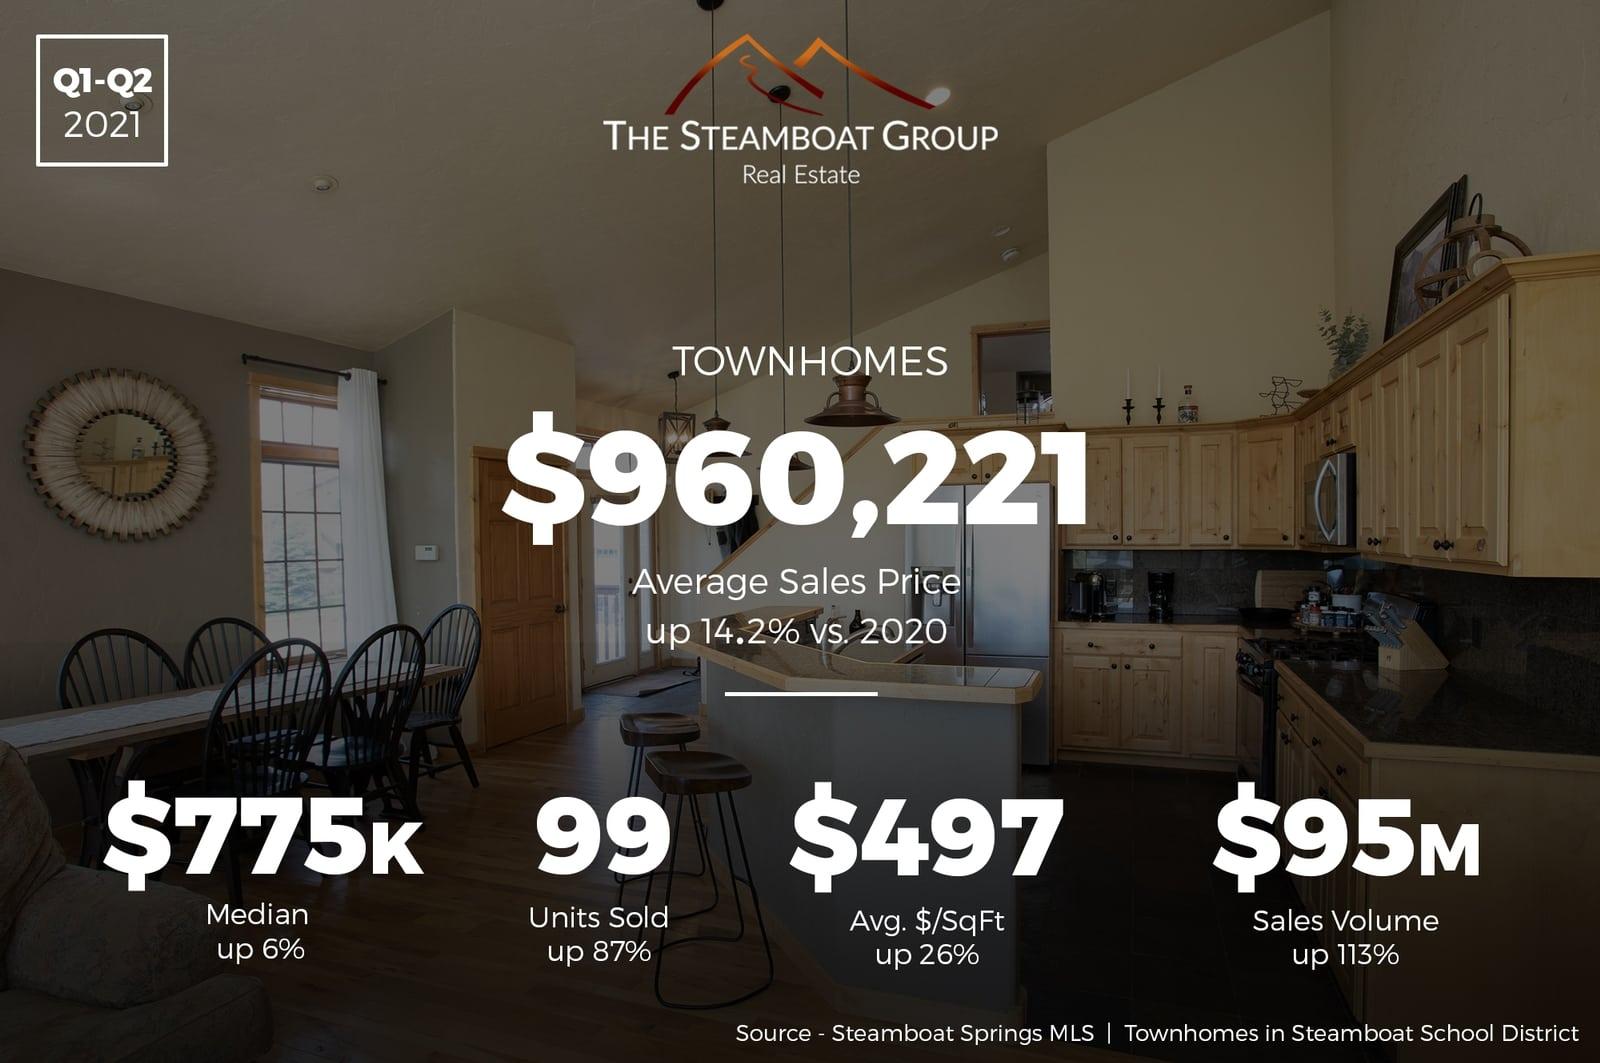 Market Update: 2021 Q2 Townhomes